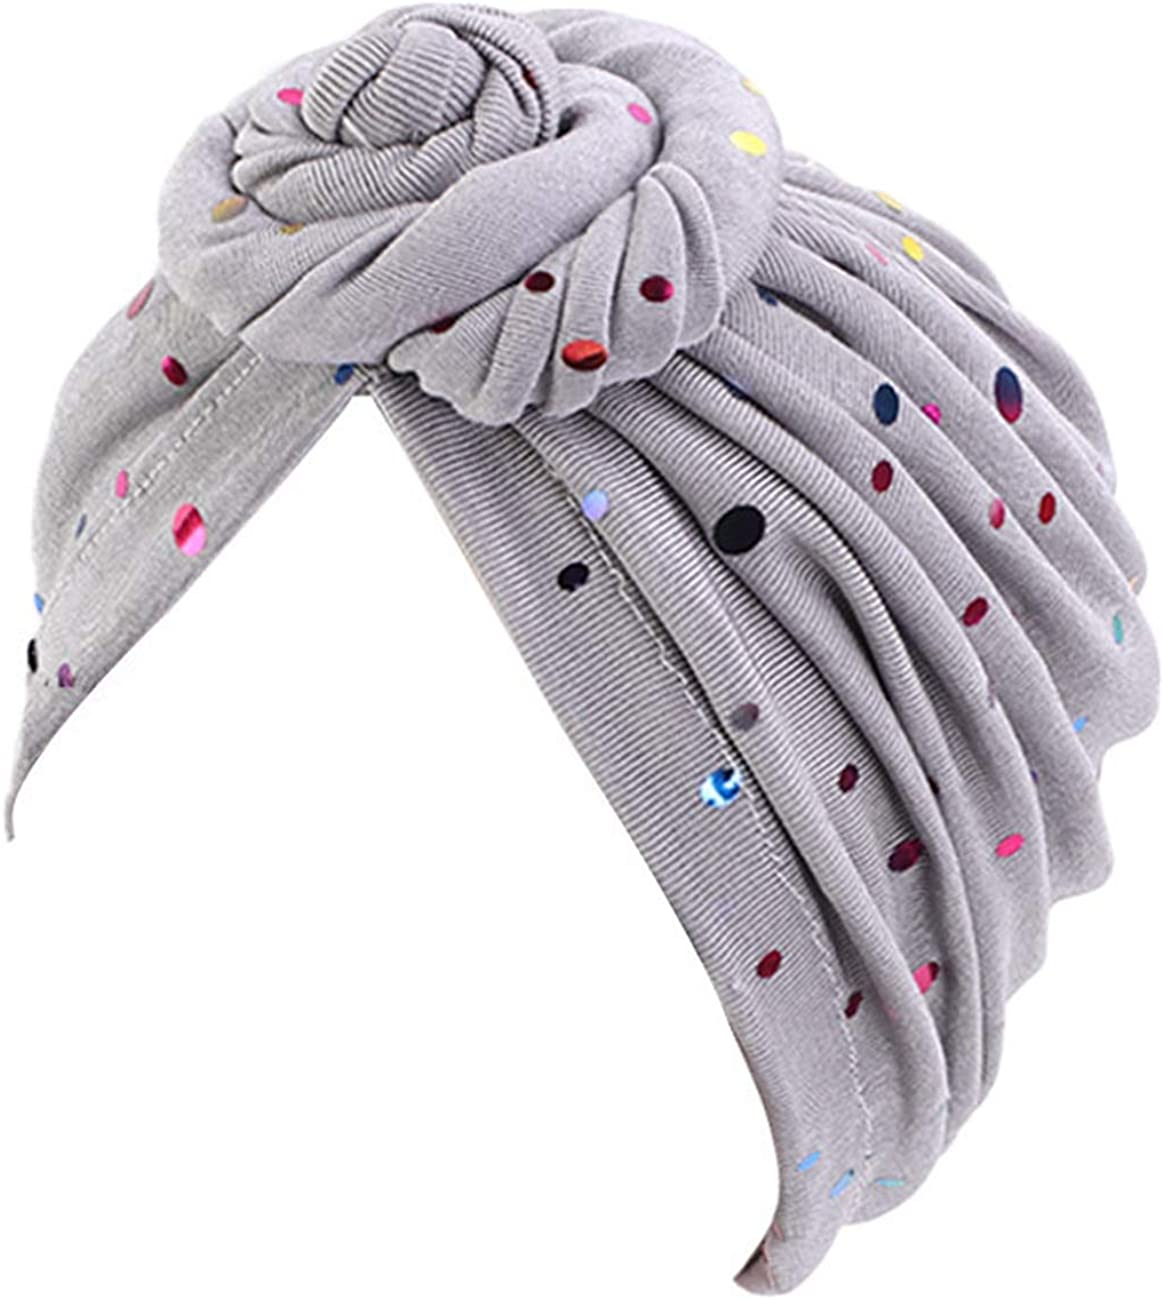 HZUX Fashion Hijabs Ranking TOP13 for Women Muslim India Max 66% OFF Ha Head Soft Headwear